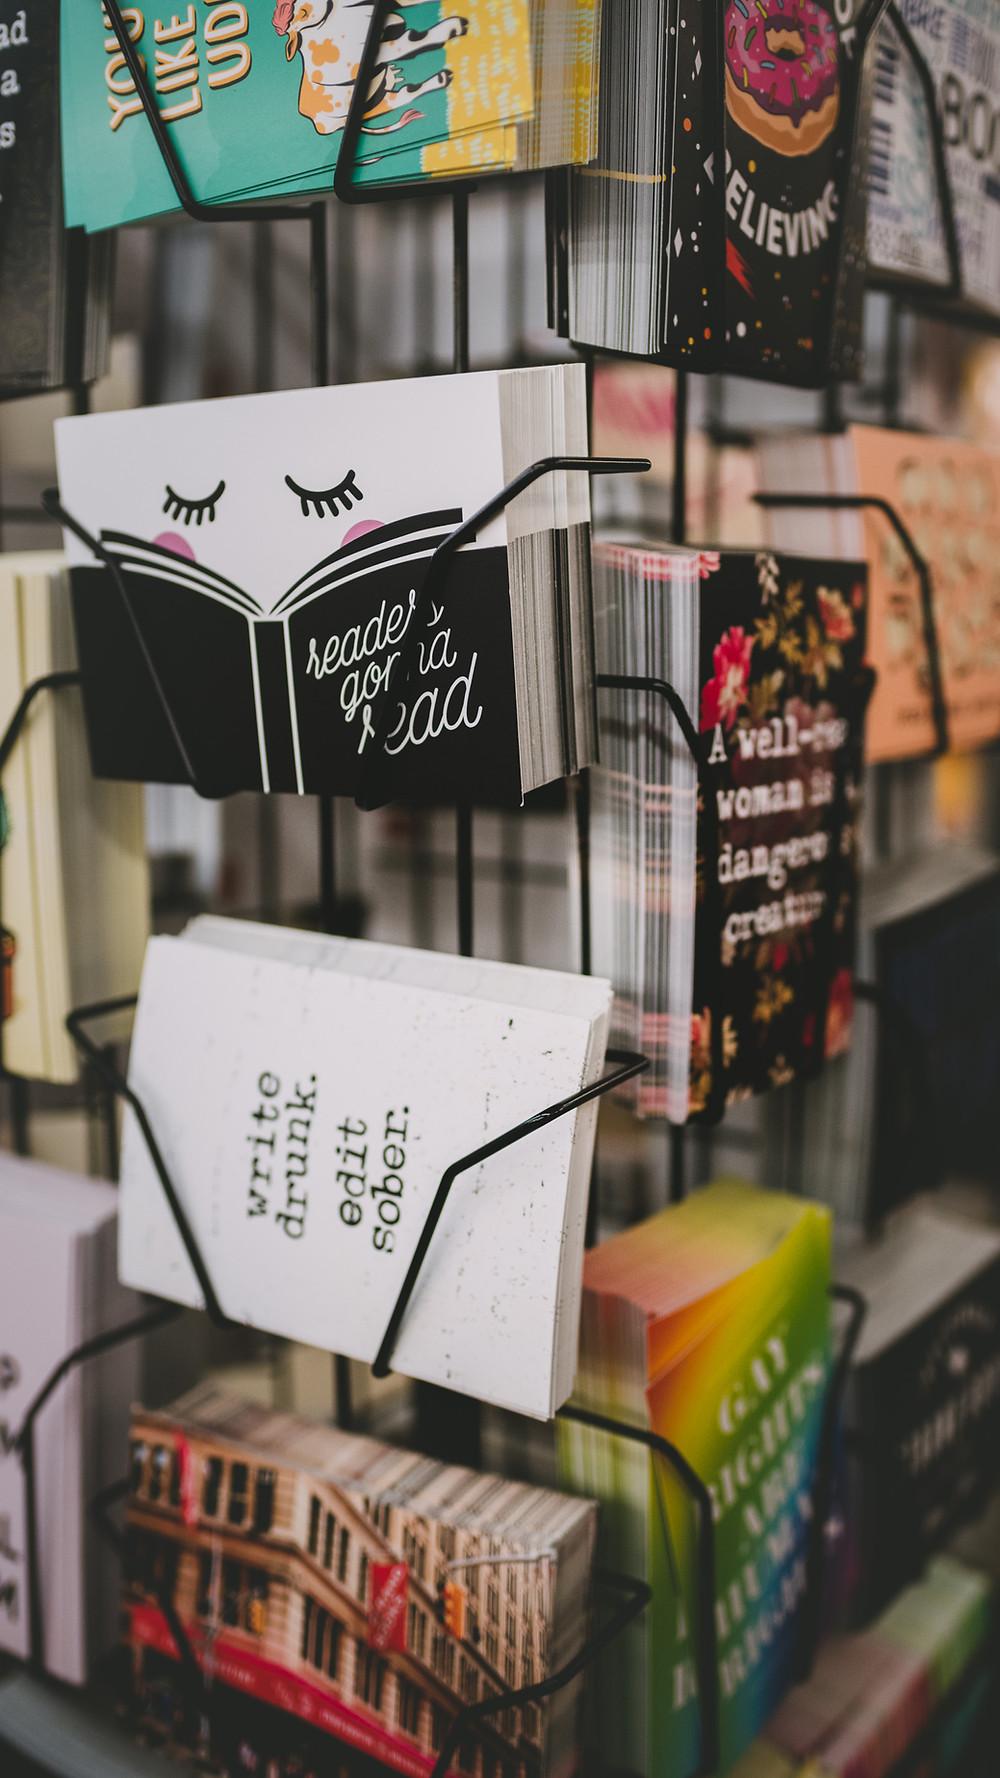 Strand Bookstore (c) Silvie Bonne